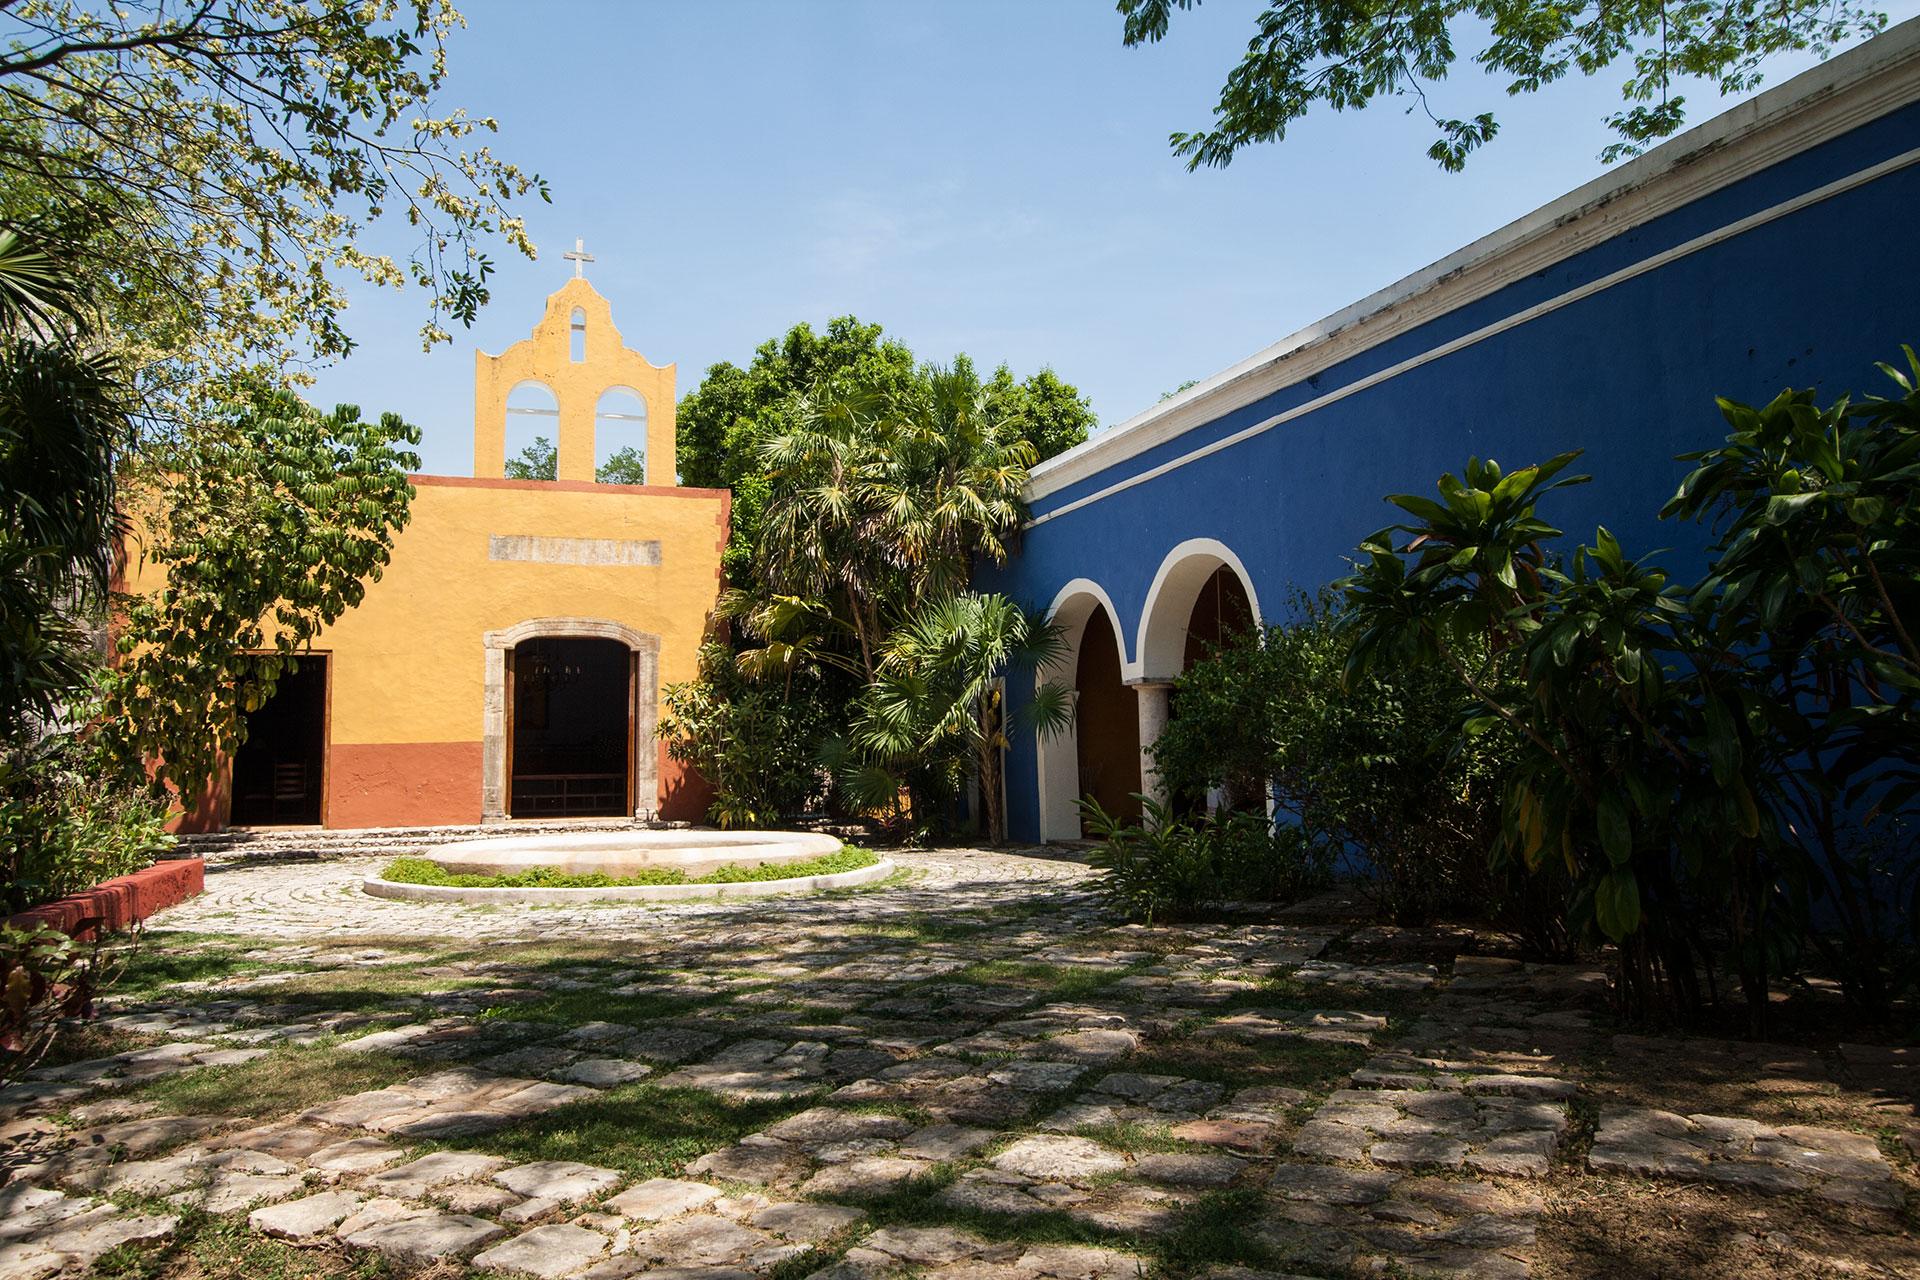 Hacienda San Jose, the chapel